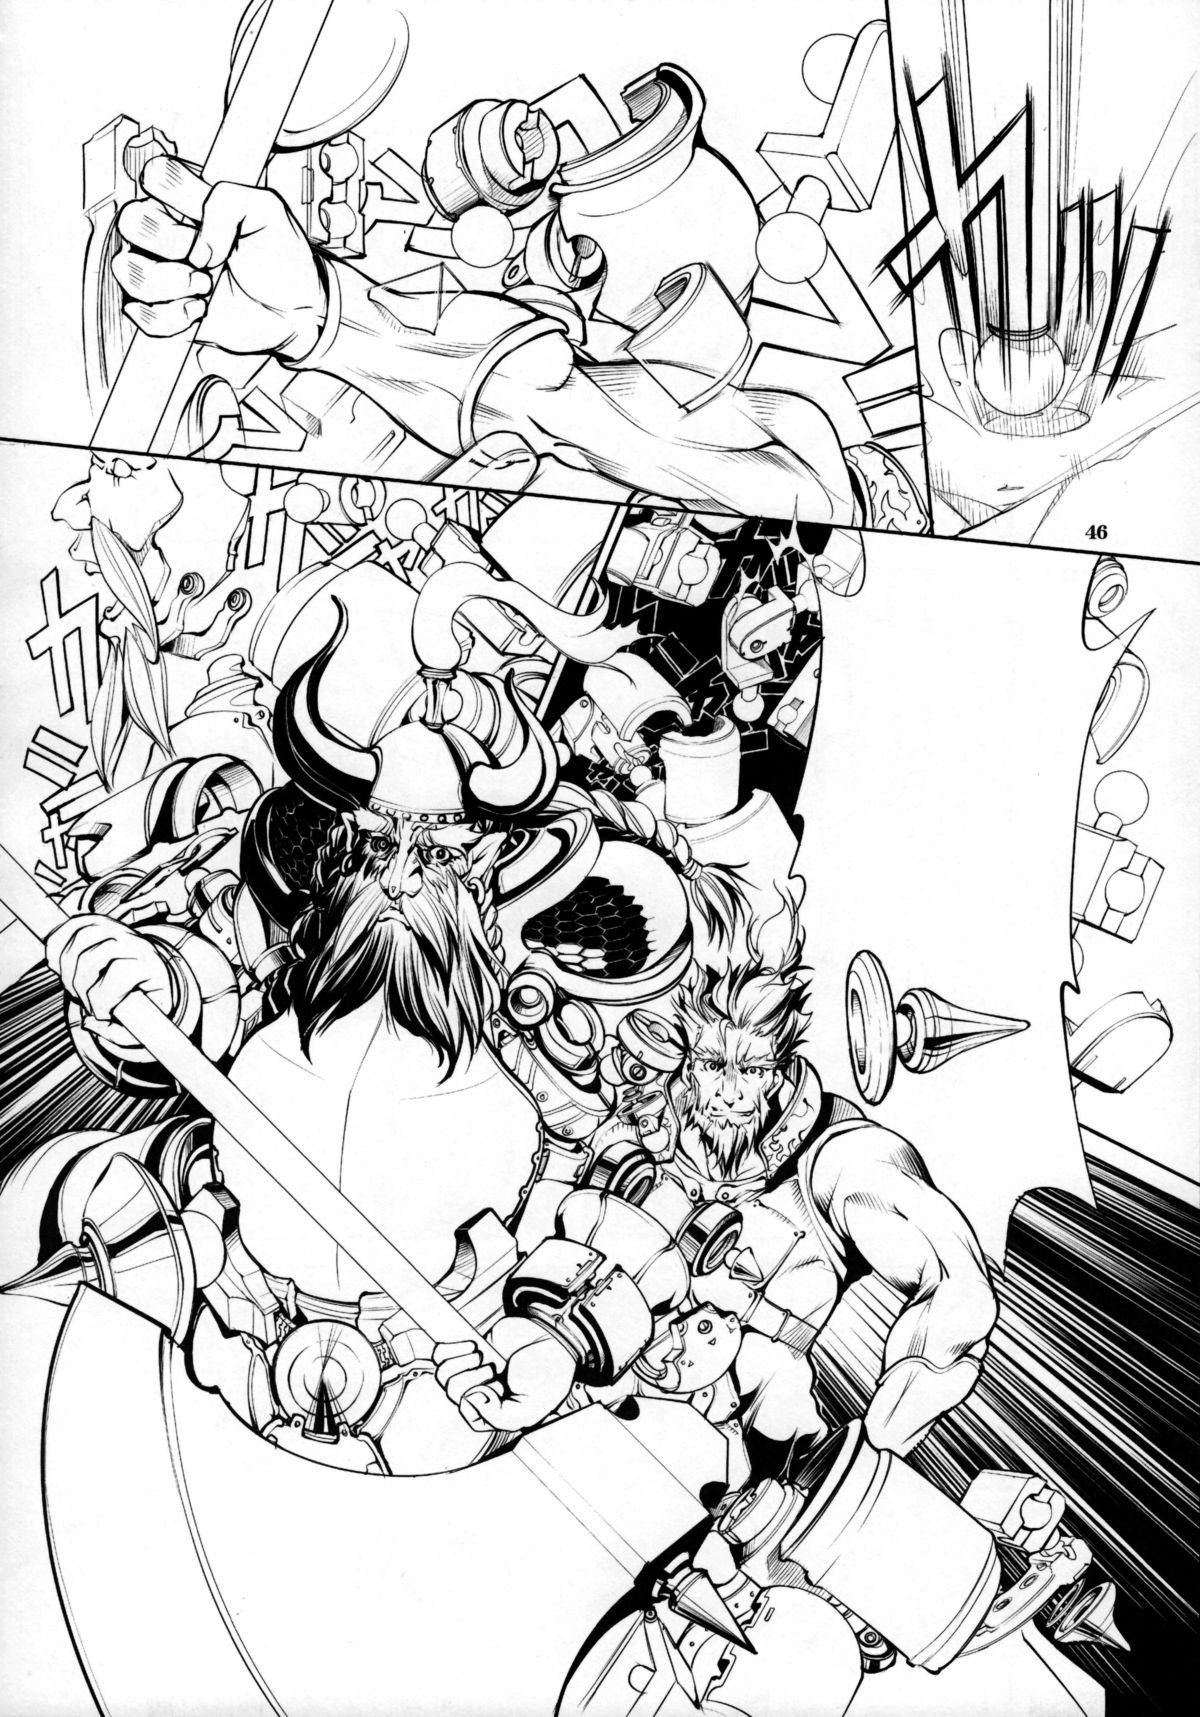 (C89) [Algolagnia (Mikoshiro Honnin)] Naruto [saga] sei (NARUTO) 45